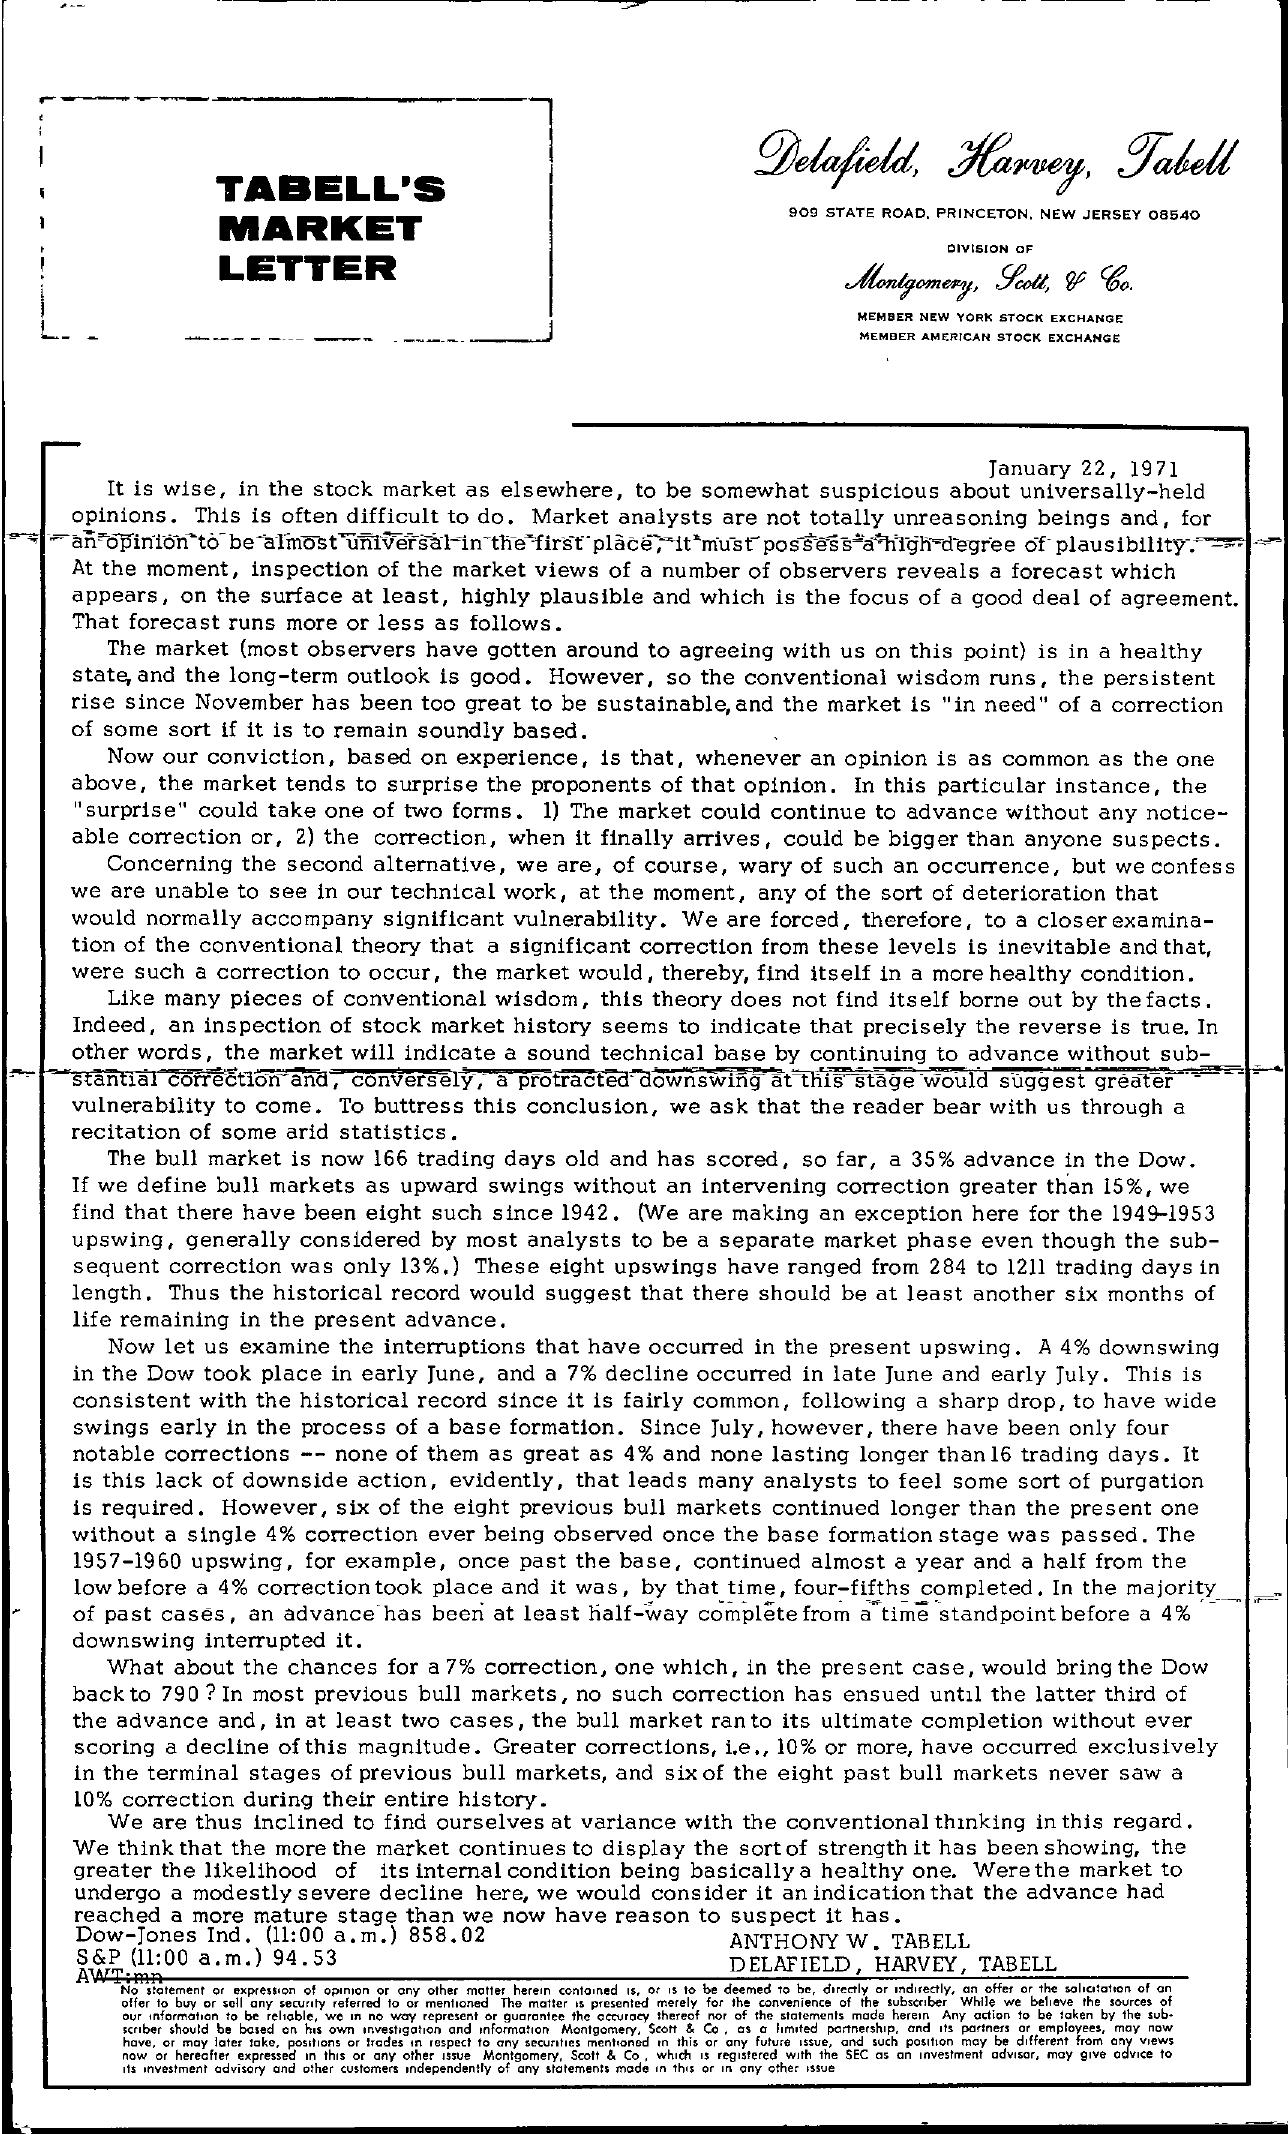 Tabell's Market Letter - January 22, 1971